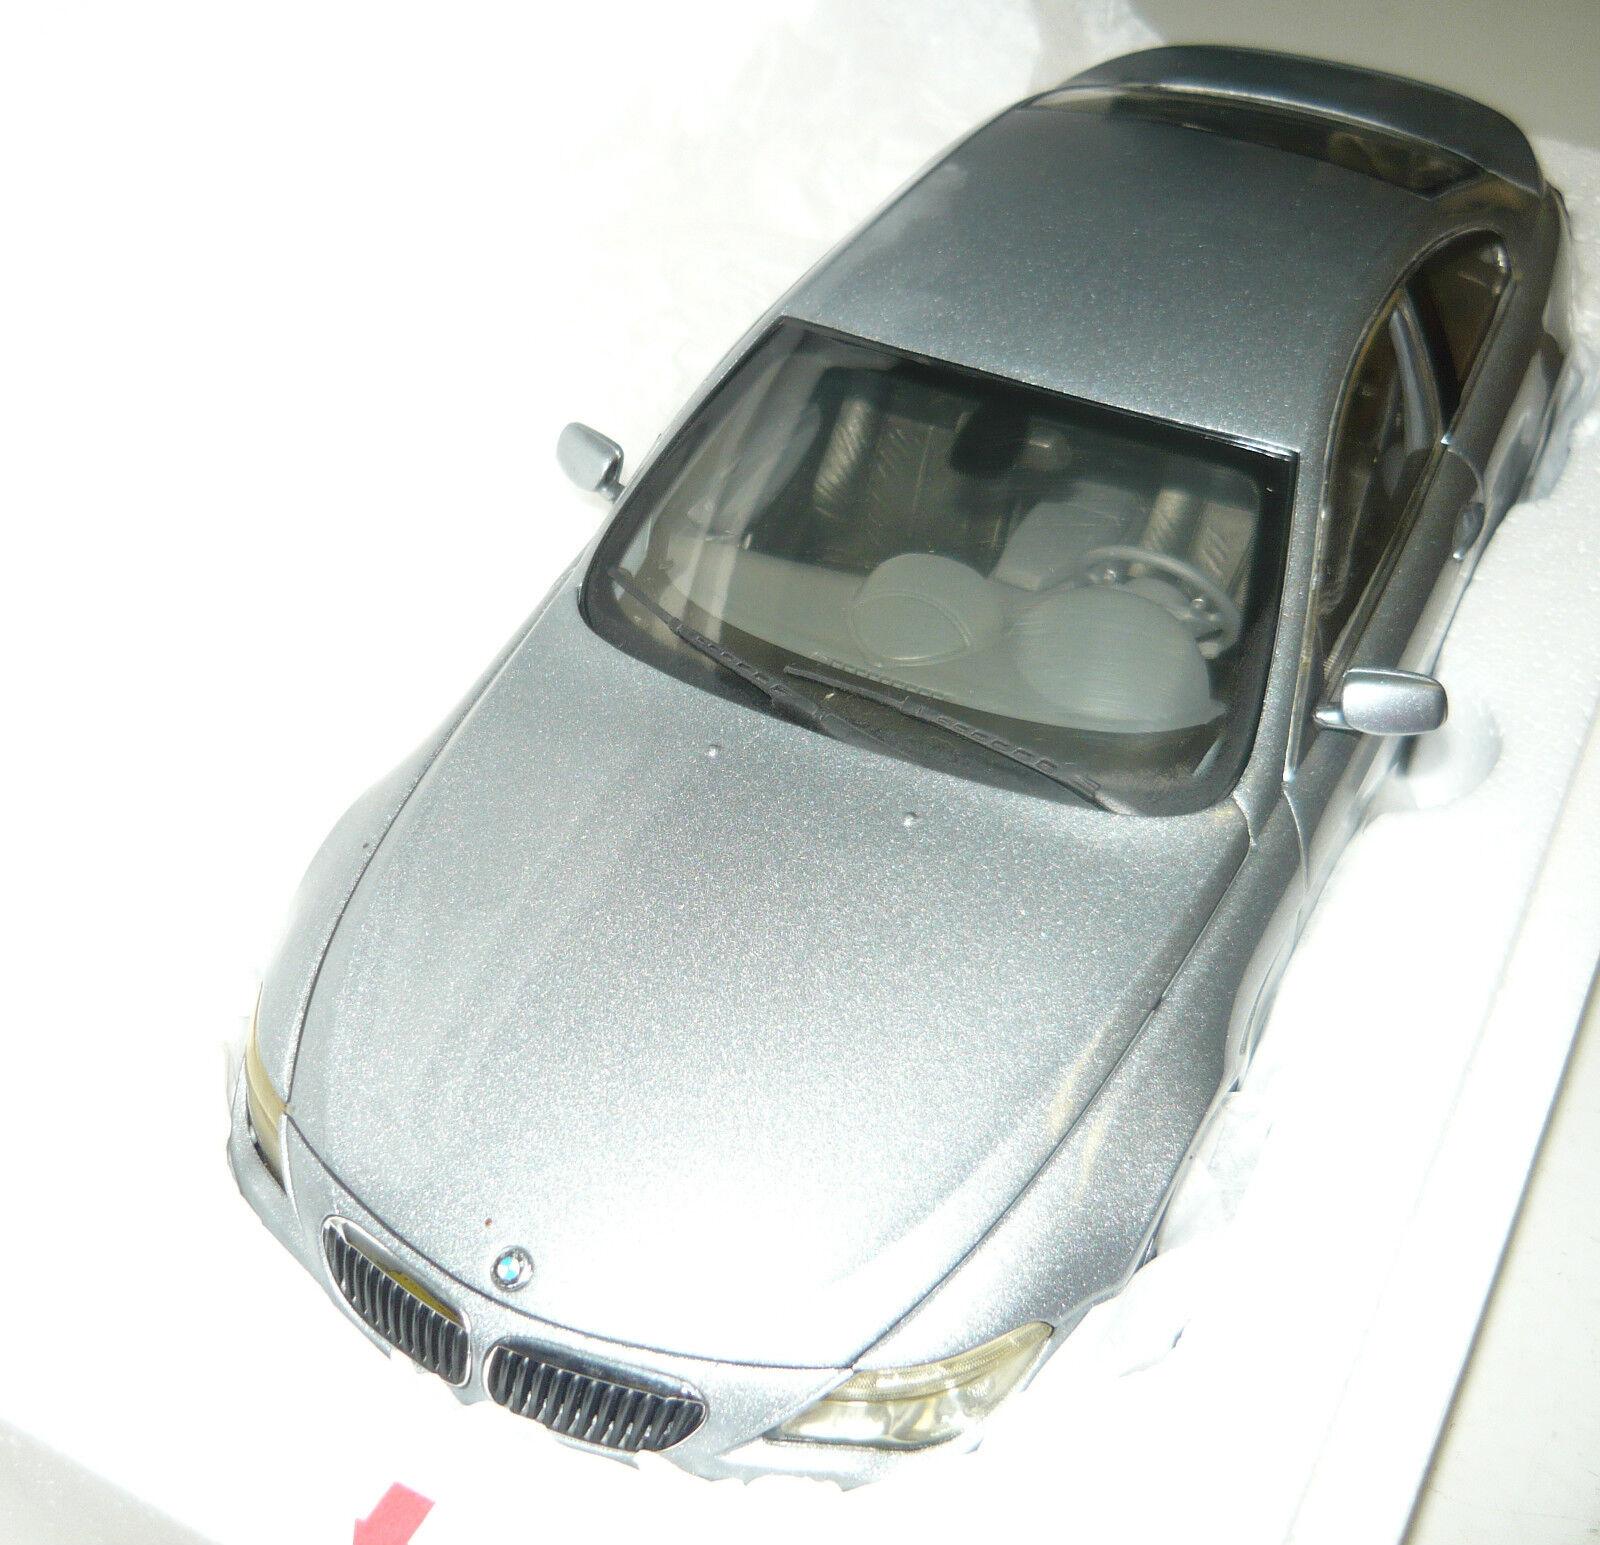 Kyosho 08701 S BMW 645ci Coupe, argent, 1 18, neu&ovp